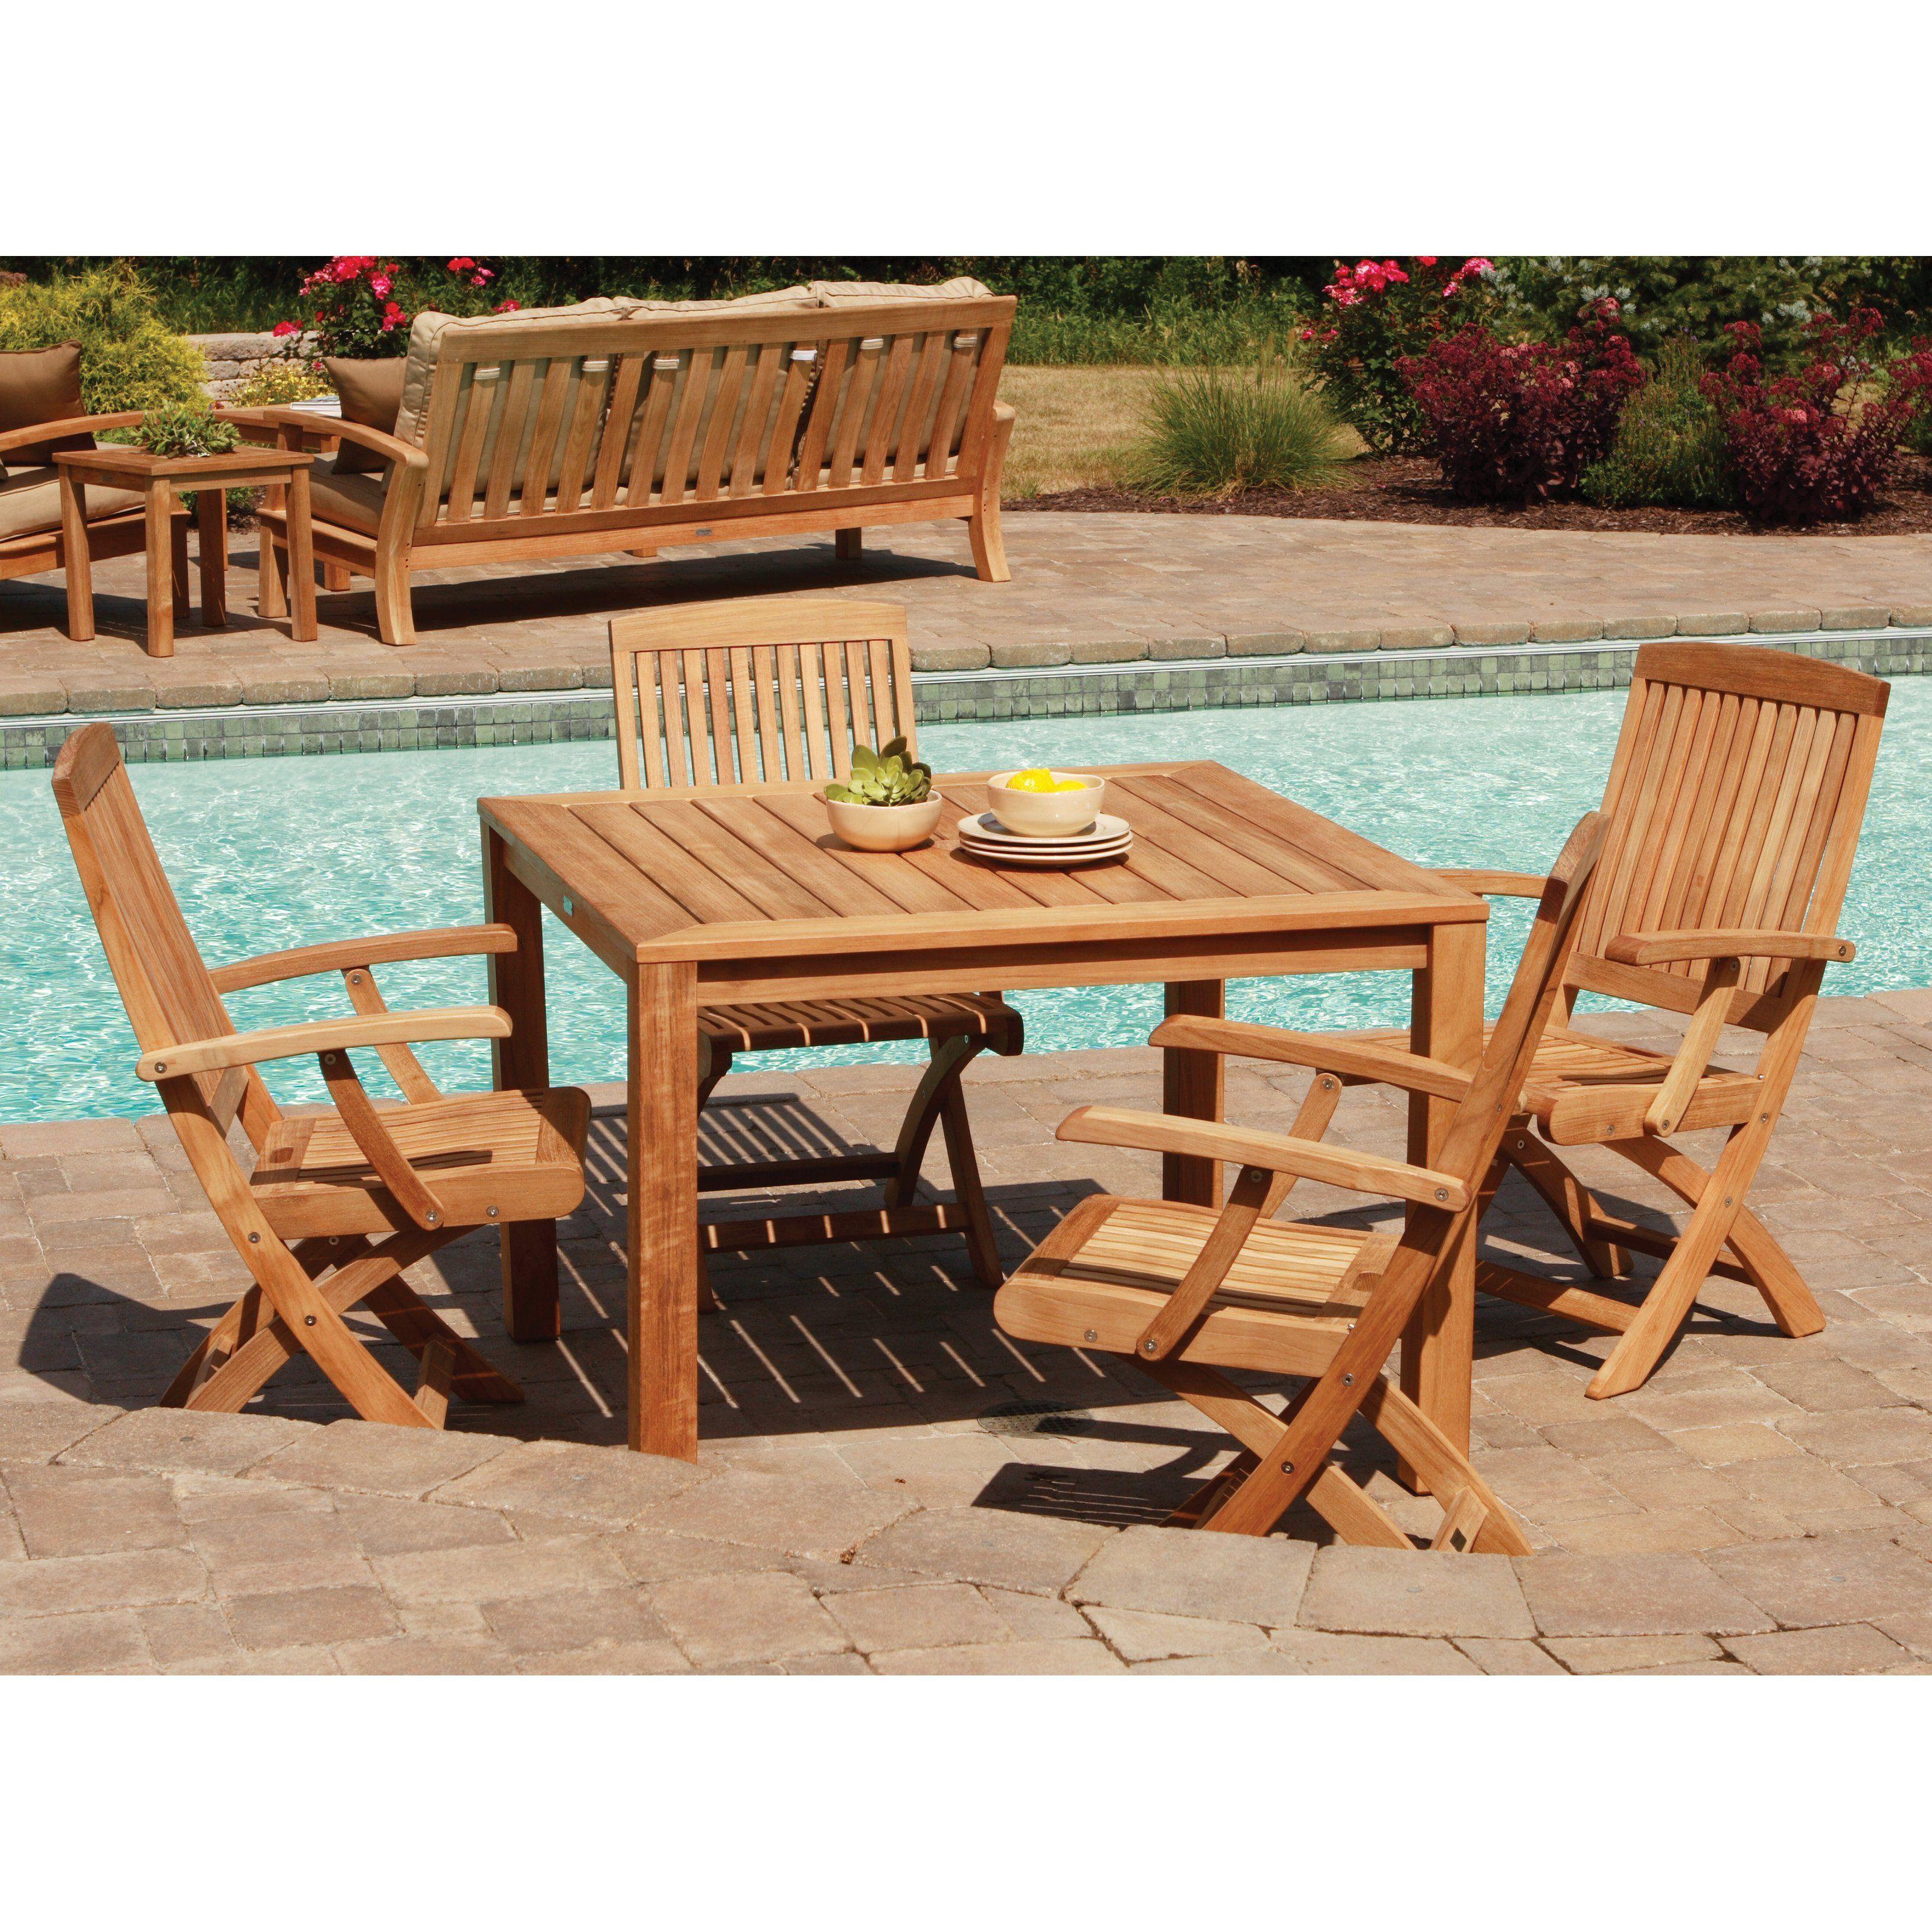 Outdoor Three Birds Braxton Square Teak Dining Set - Seats 4 - TB149